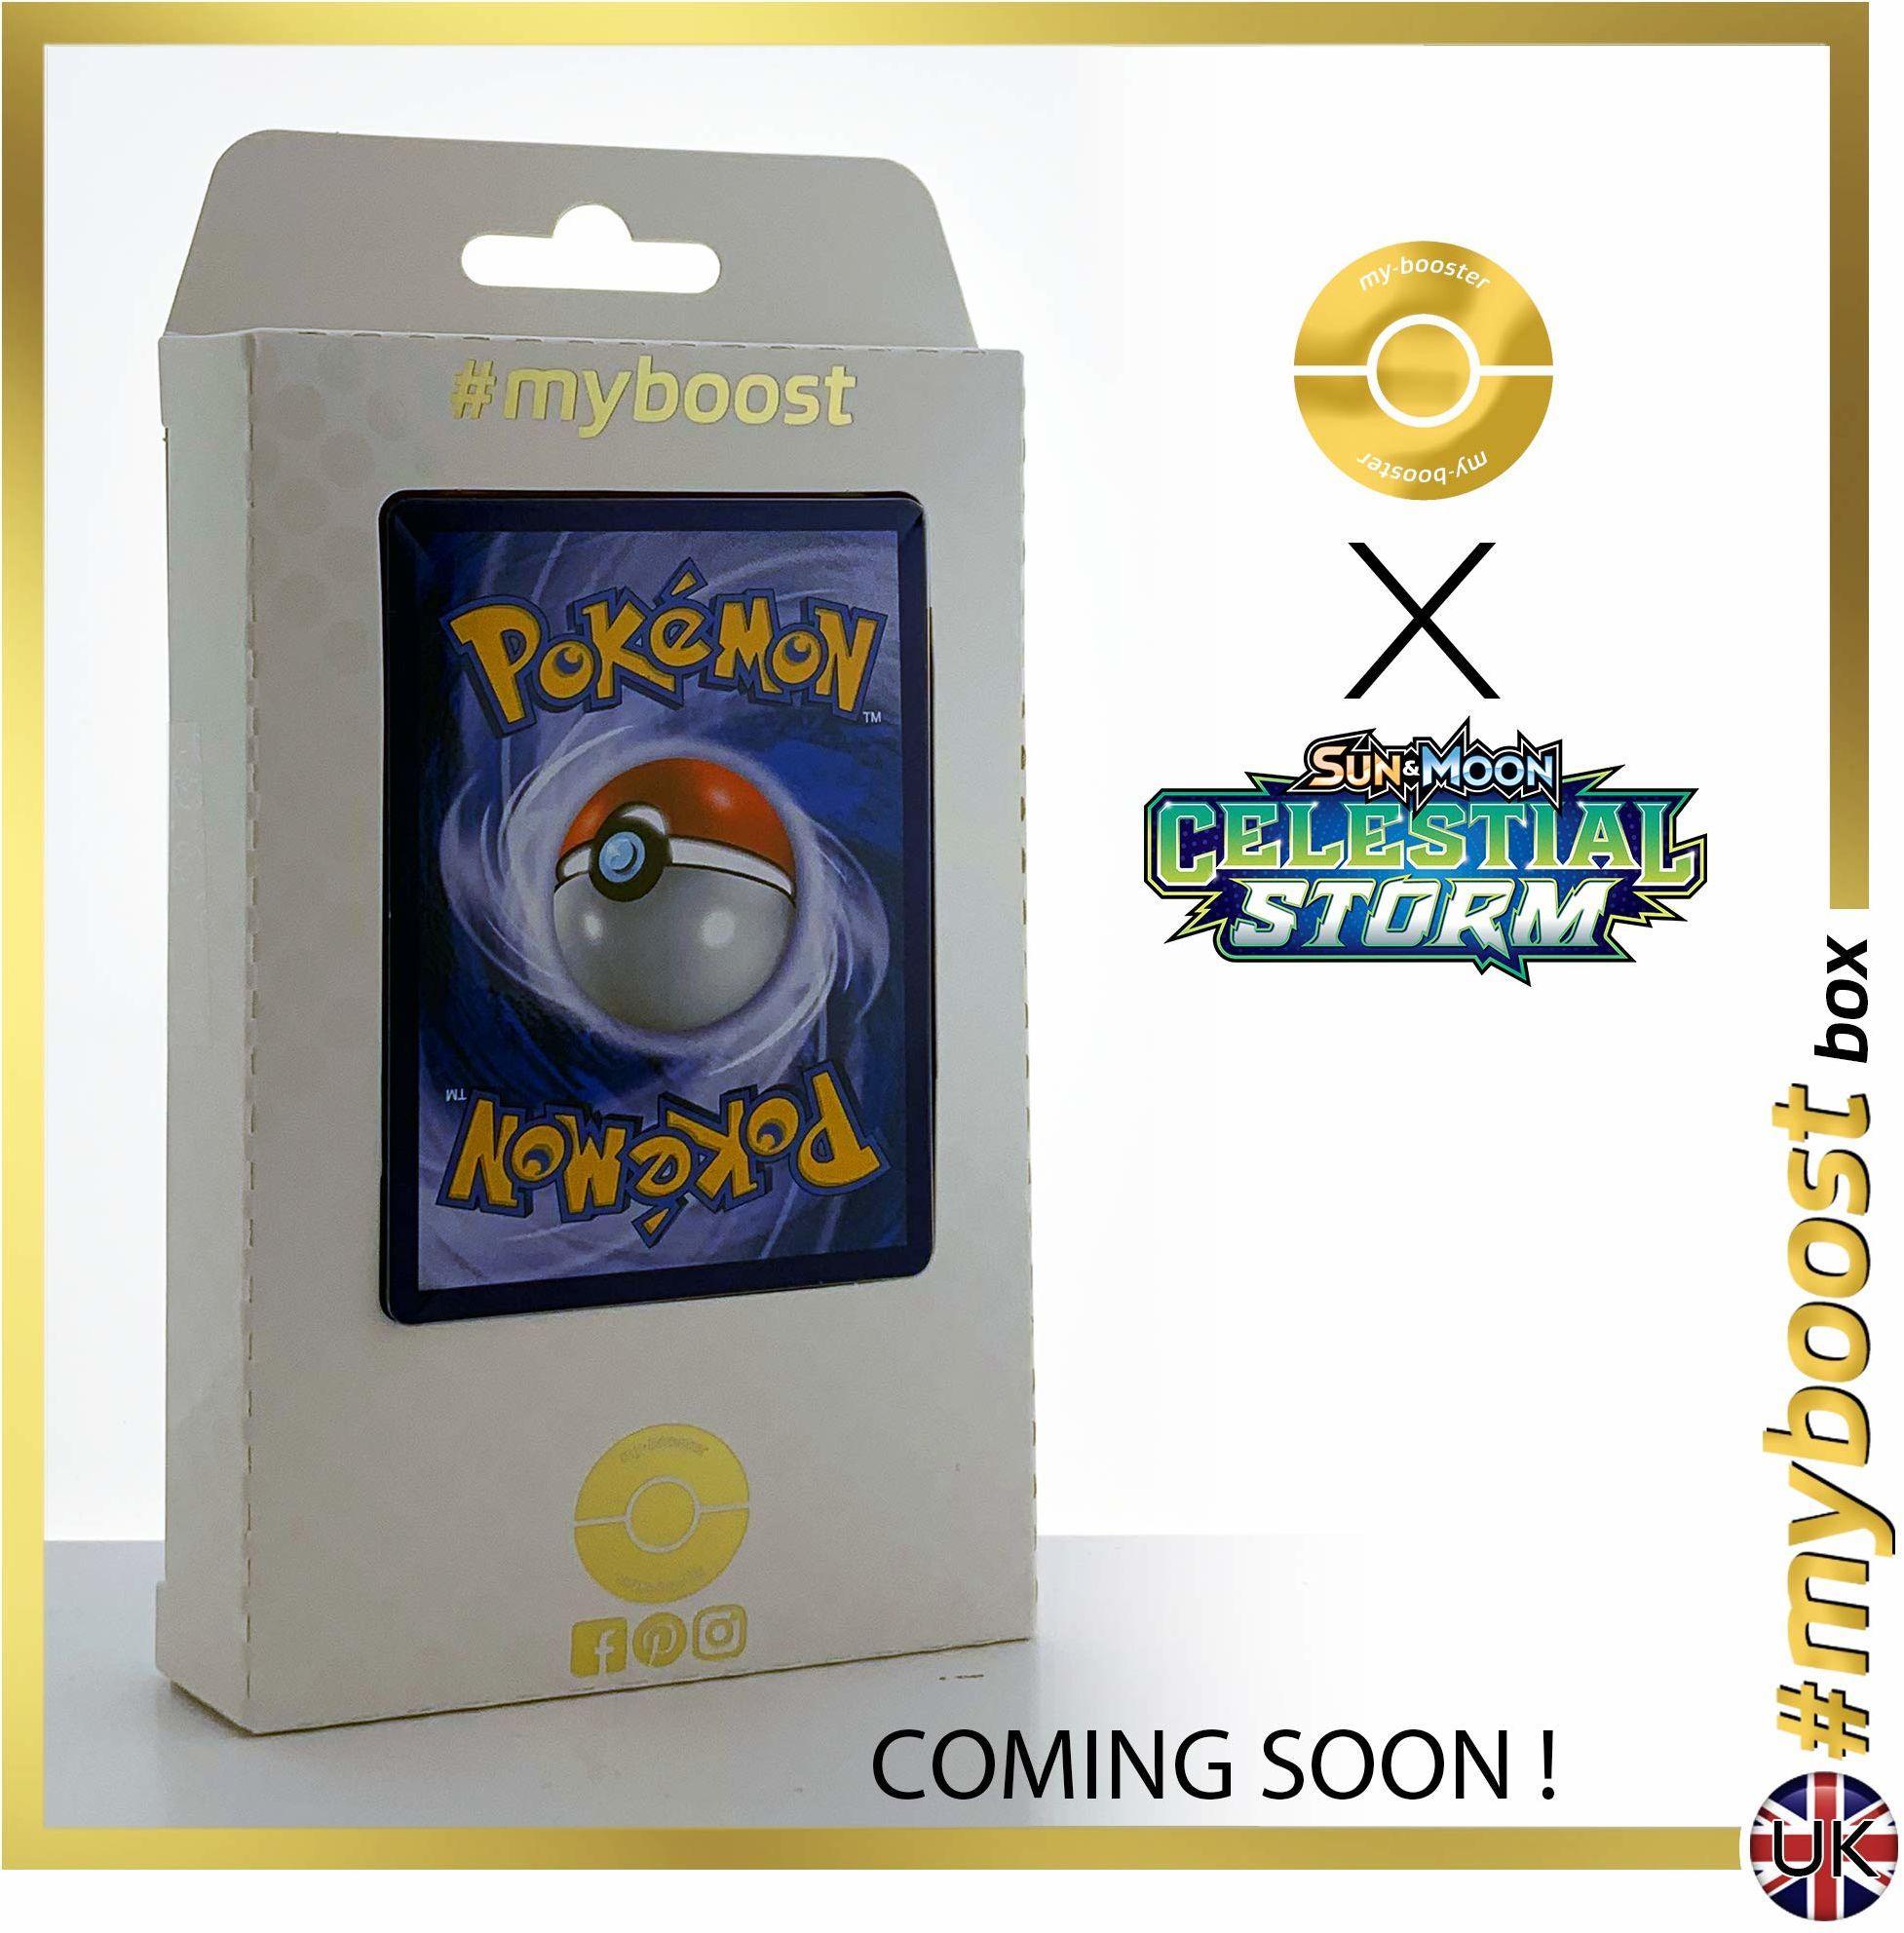 Slaking 115/168 Holo - #myboost X Sun & Moon 7 Celestrial Storm - pudełko 10 angielskich kart pokemon